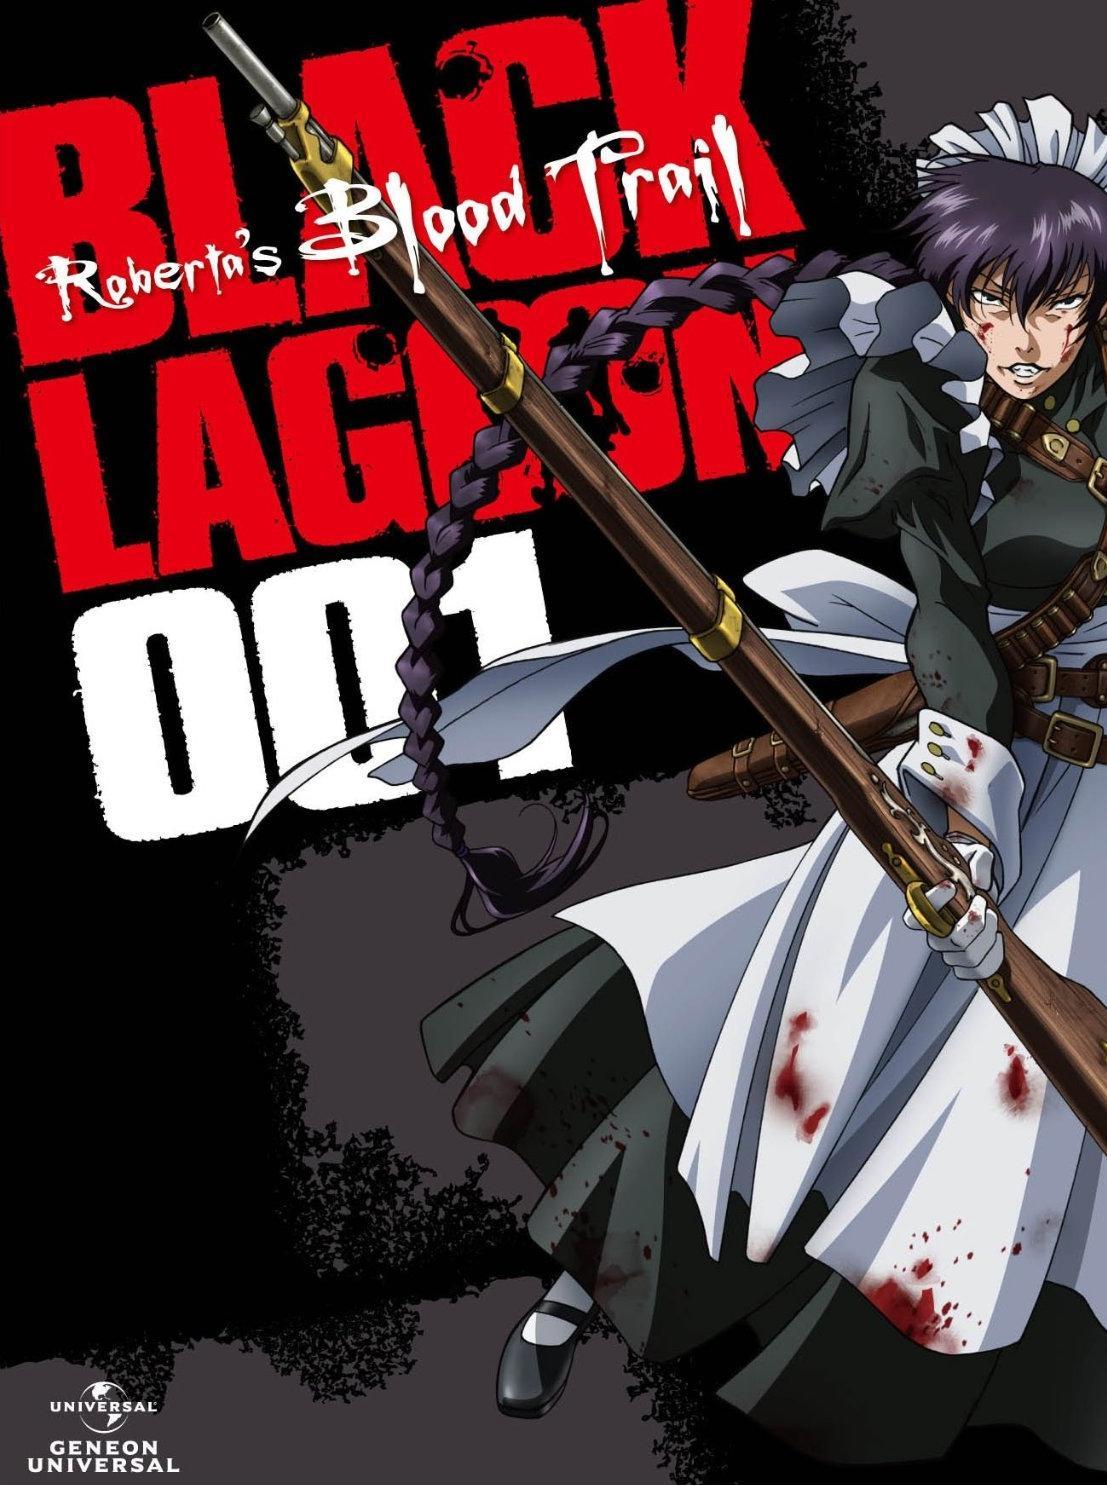 دانلود زیرنویس فارسی سریال Black Lagoon: Roberta's Blood Trail